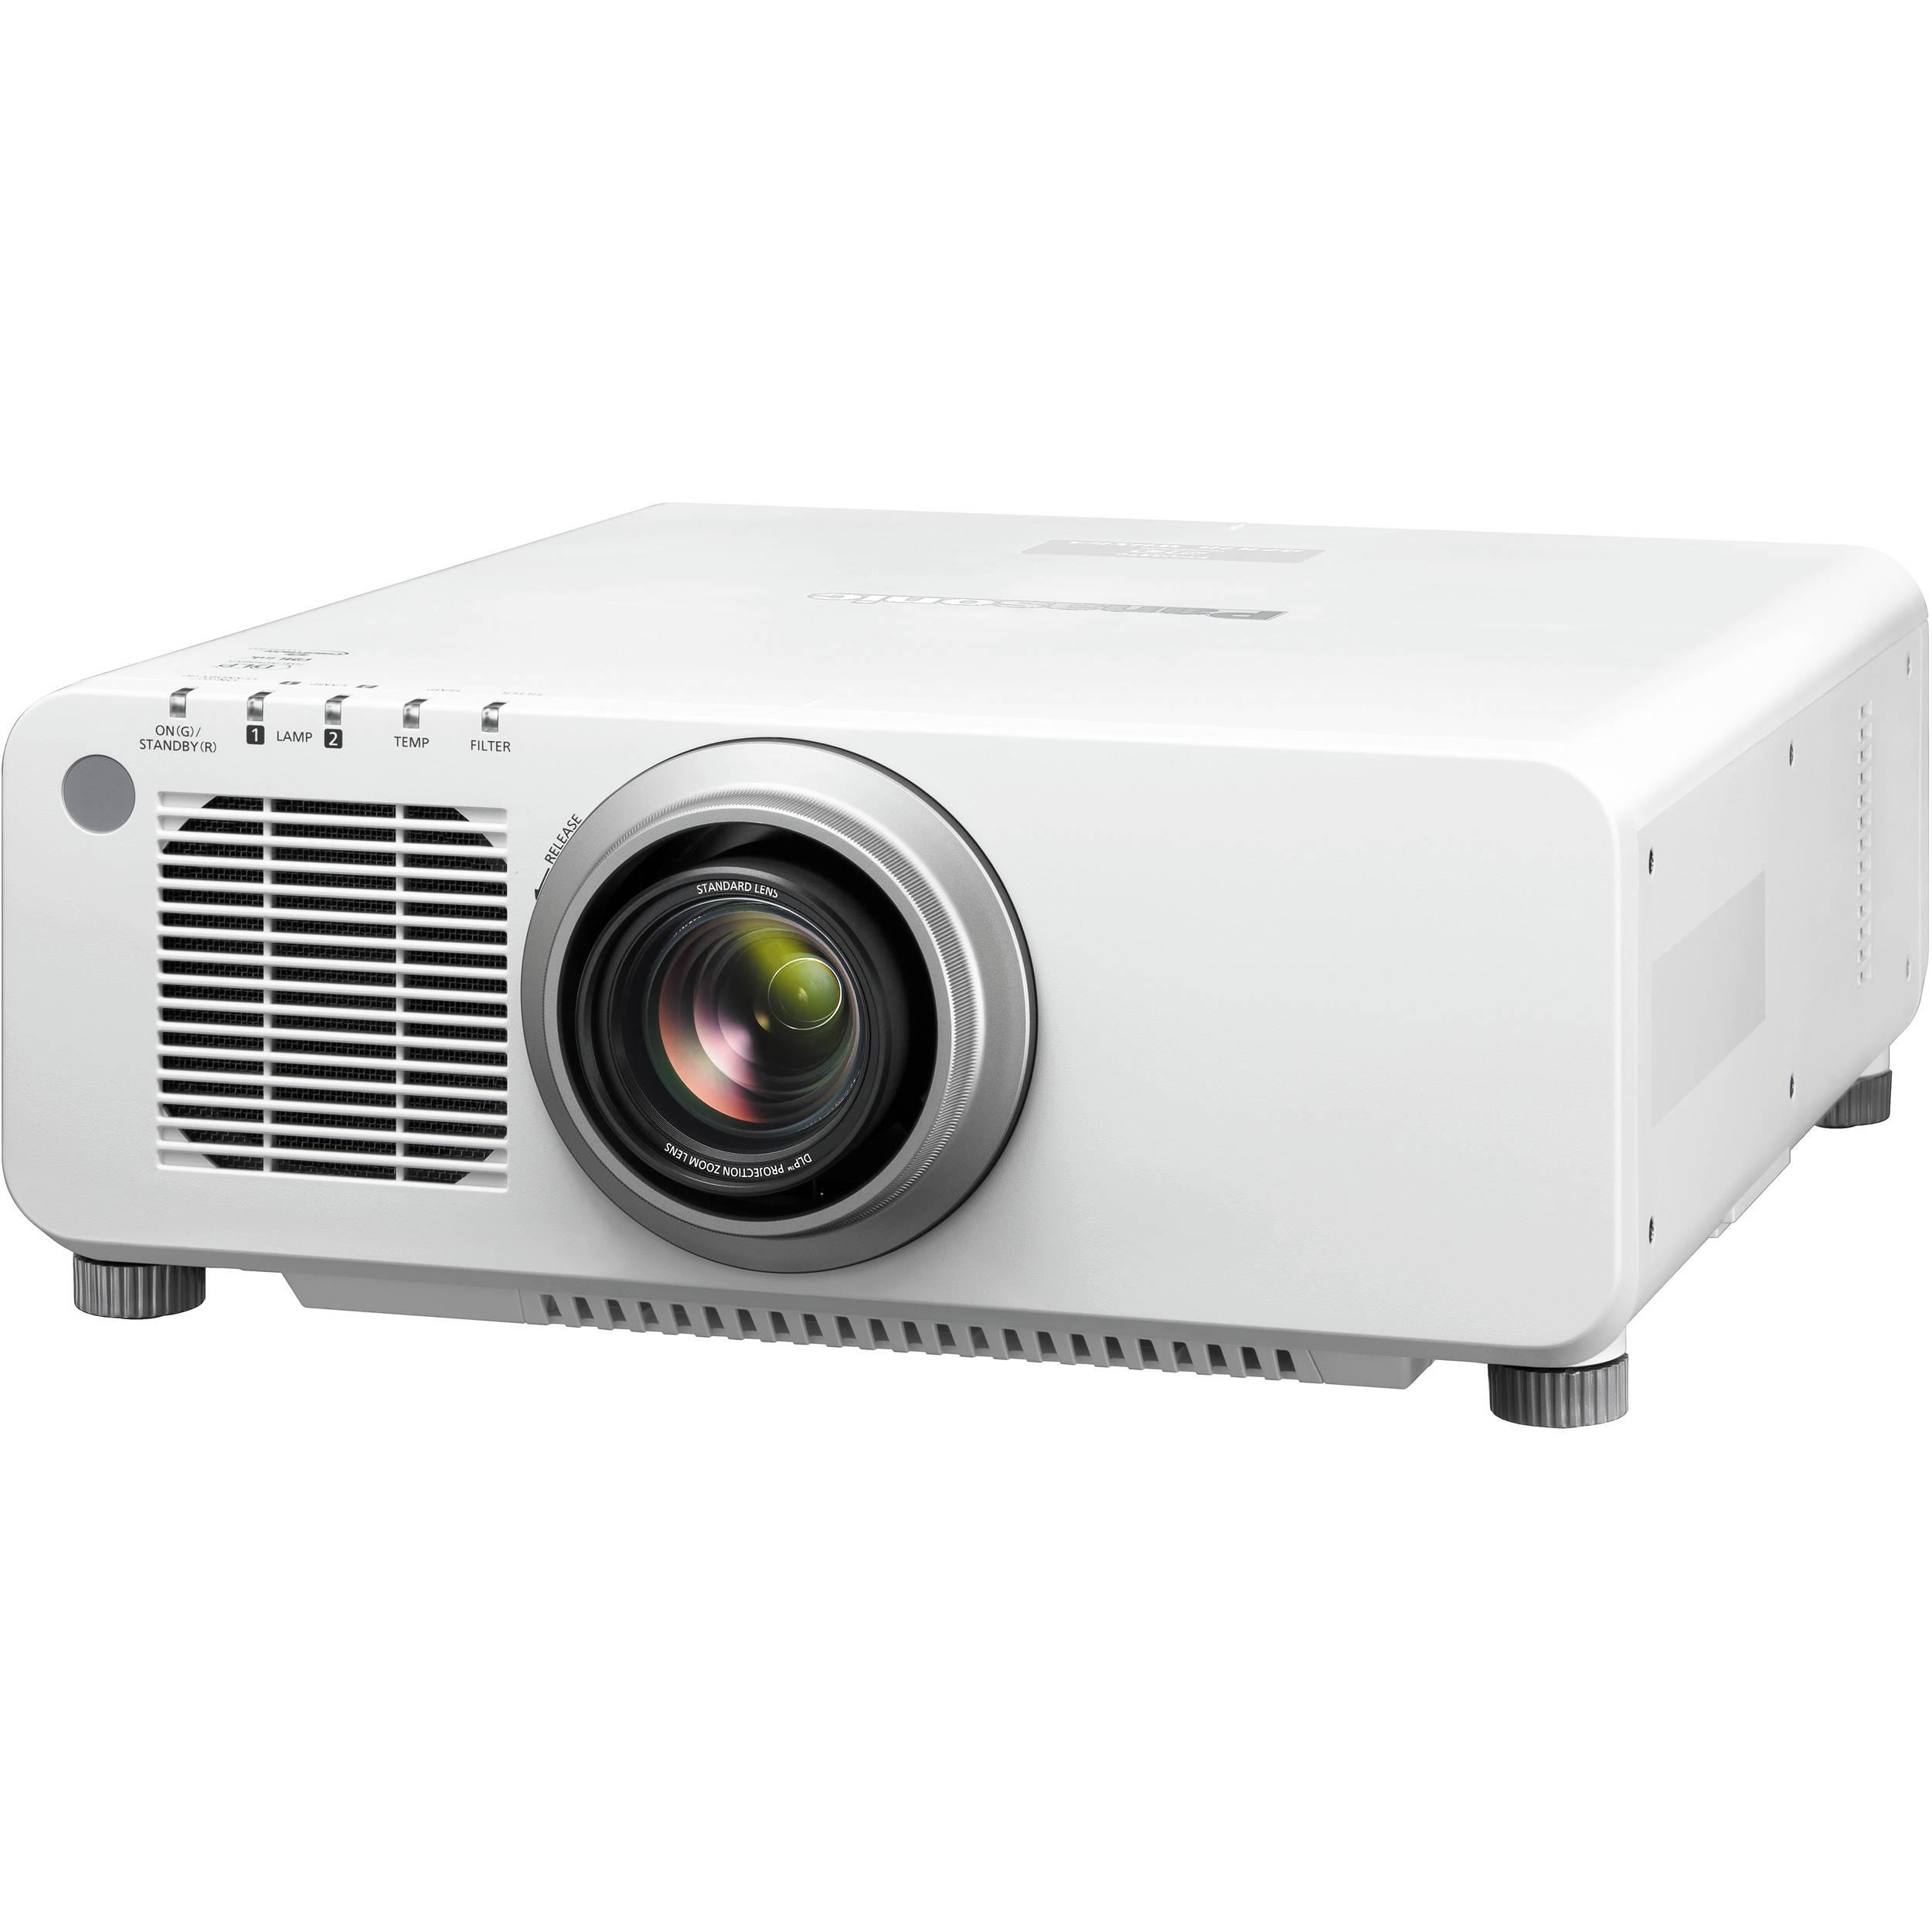 Panasonic Pt Dw830uw Wxga 1 Chip Dlp Projector White